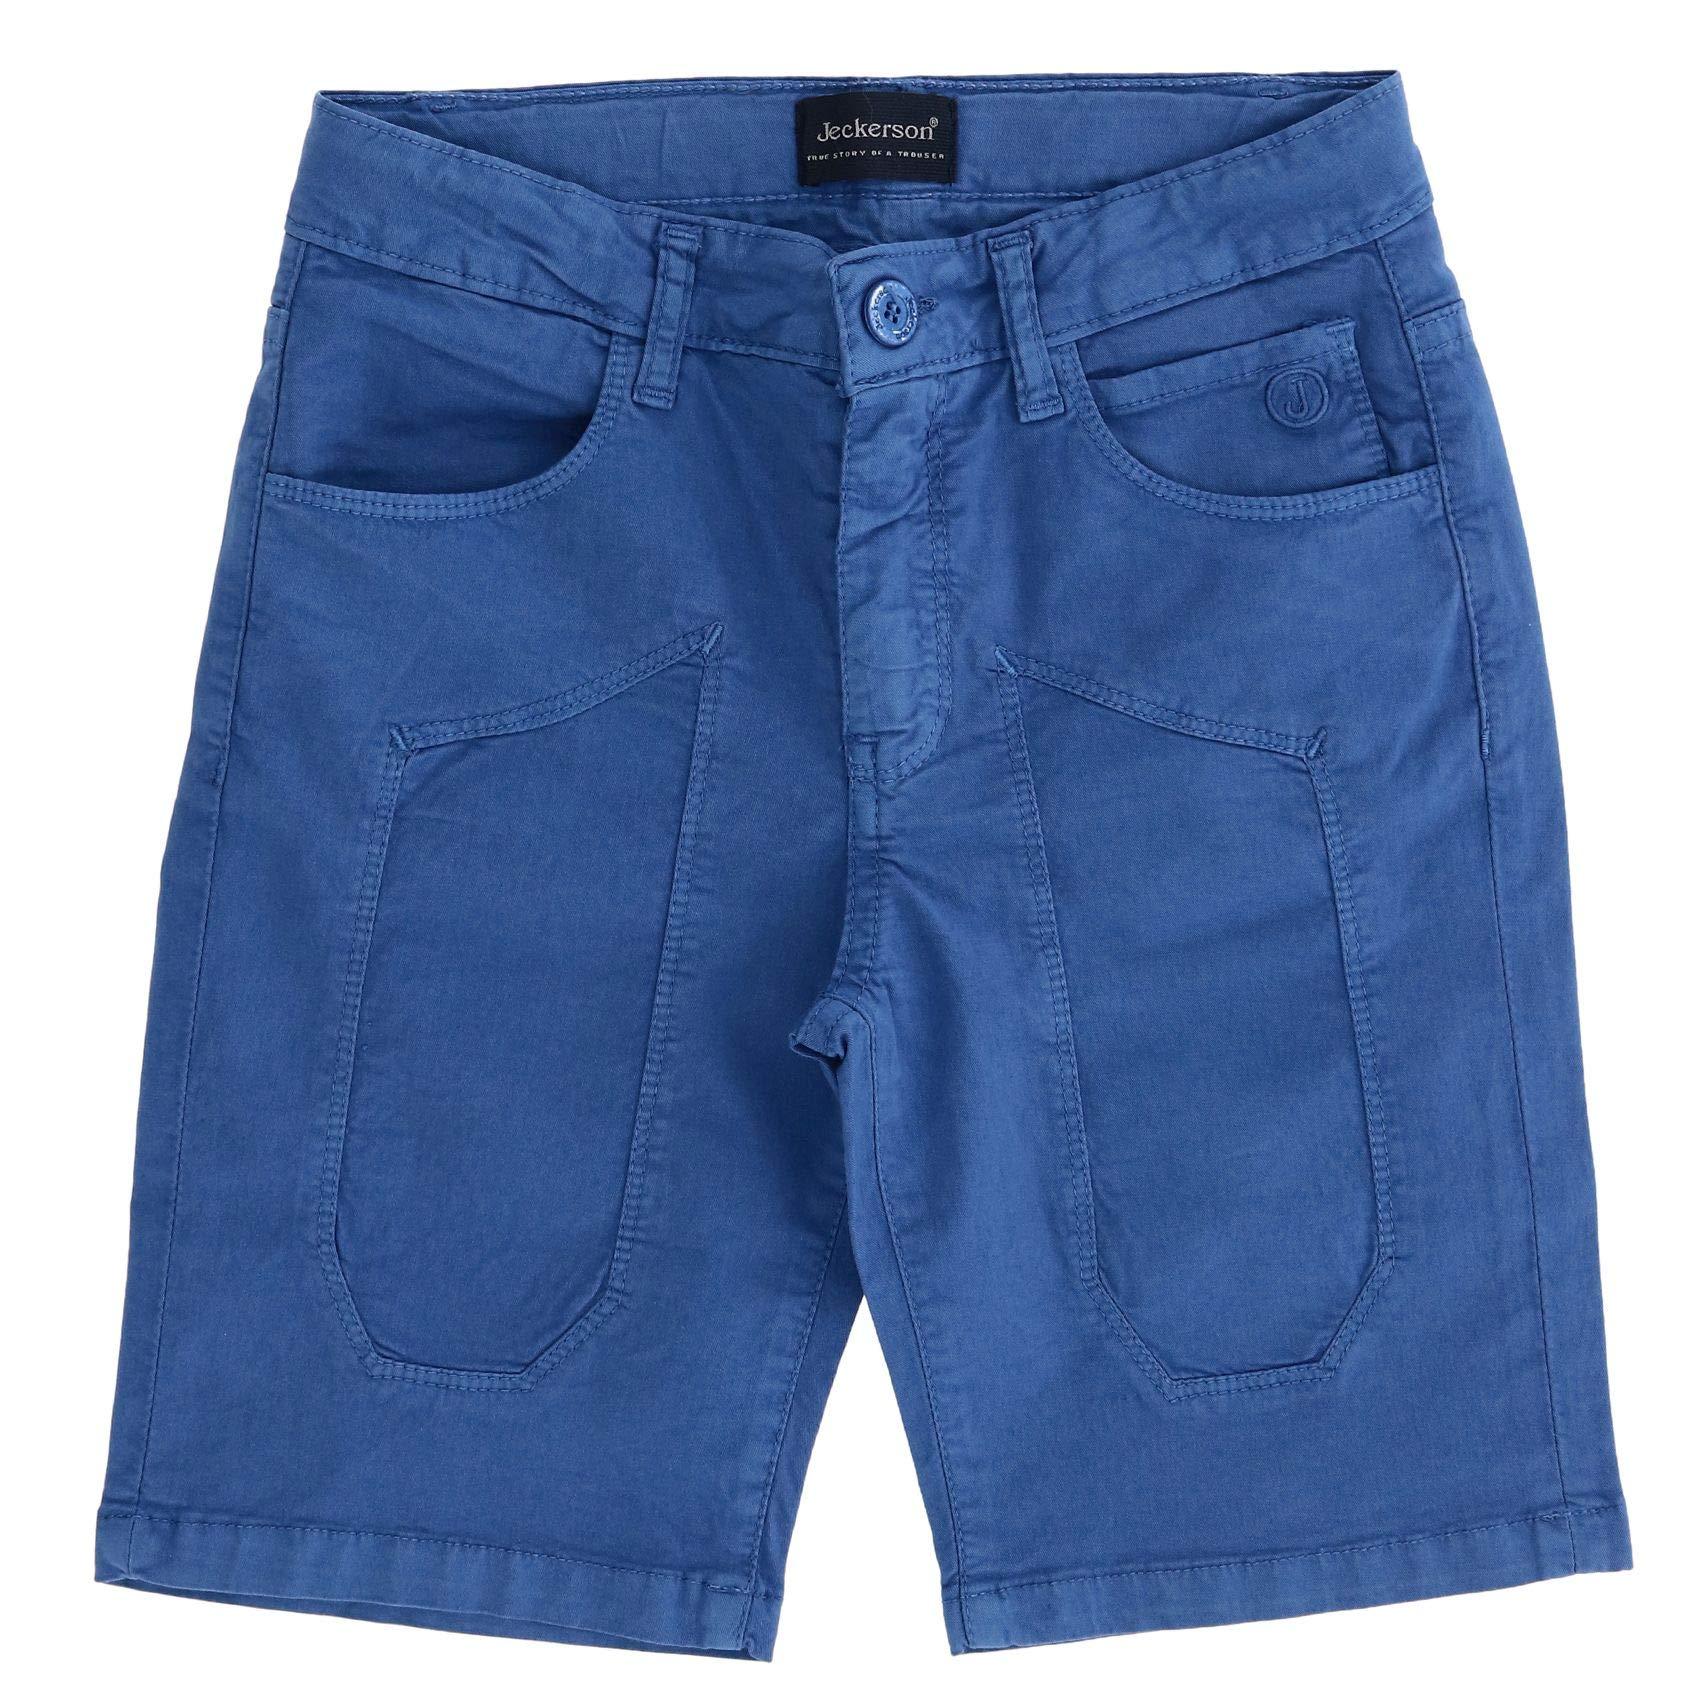 Jeckerson Boys J964blue Blue Cotton Shorts